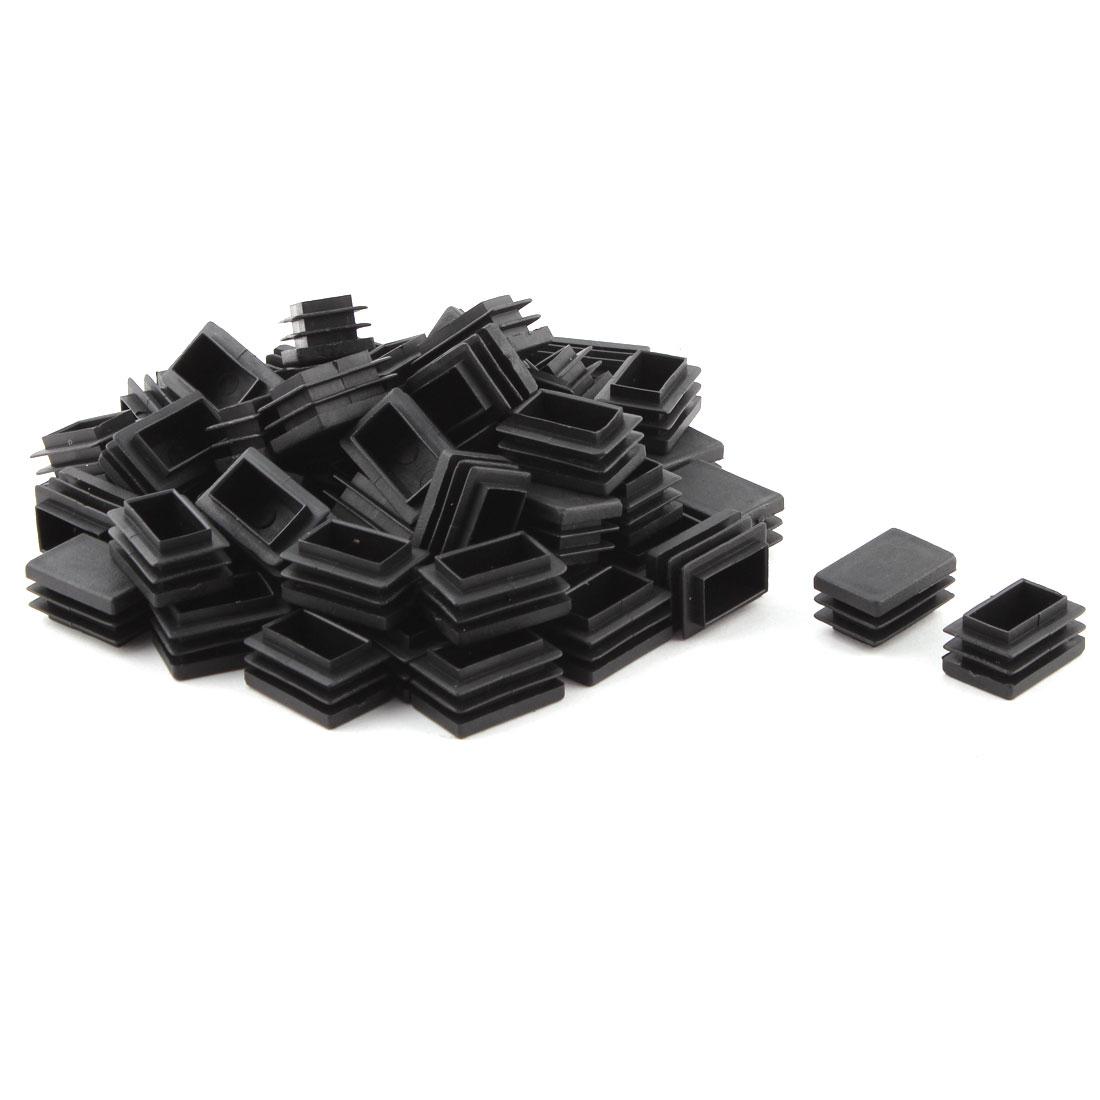 Home Office Plastic Rectangle Table Chair Leg Tube Insert Black 20 x 30mm 60pcs